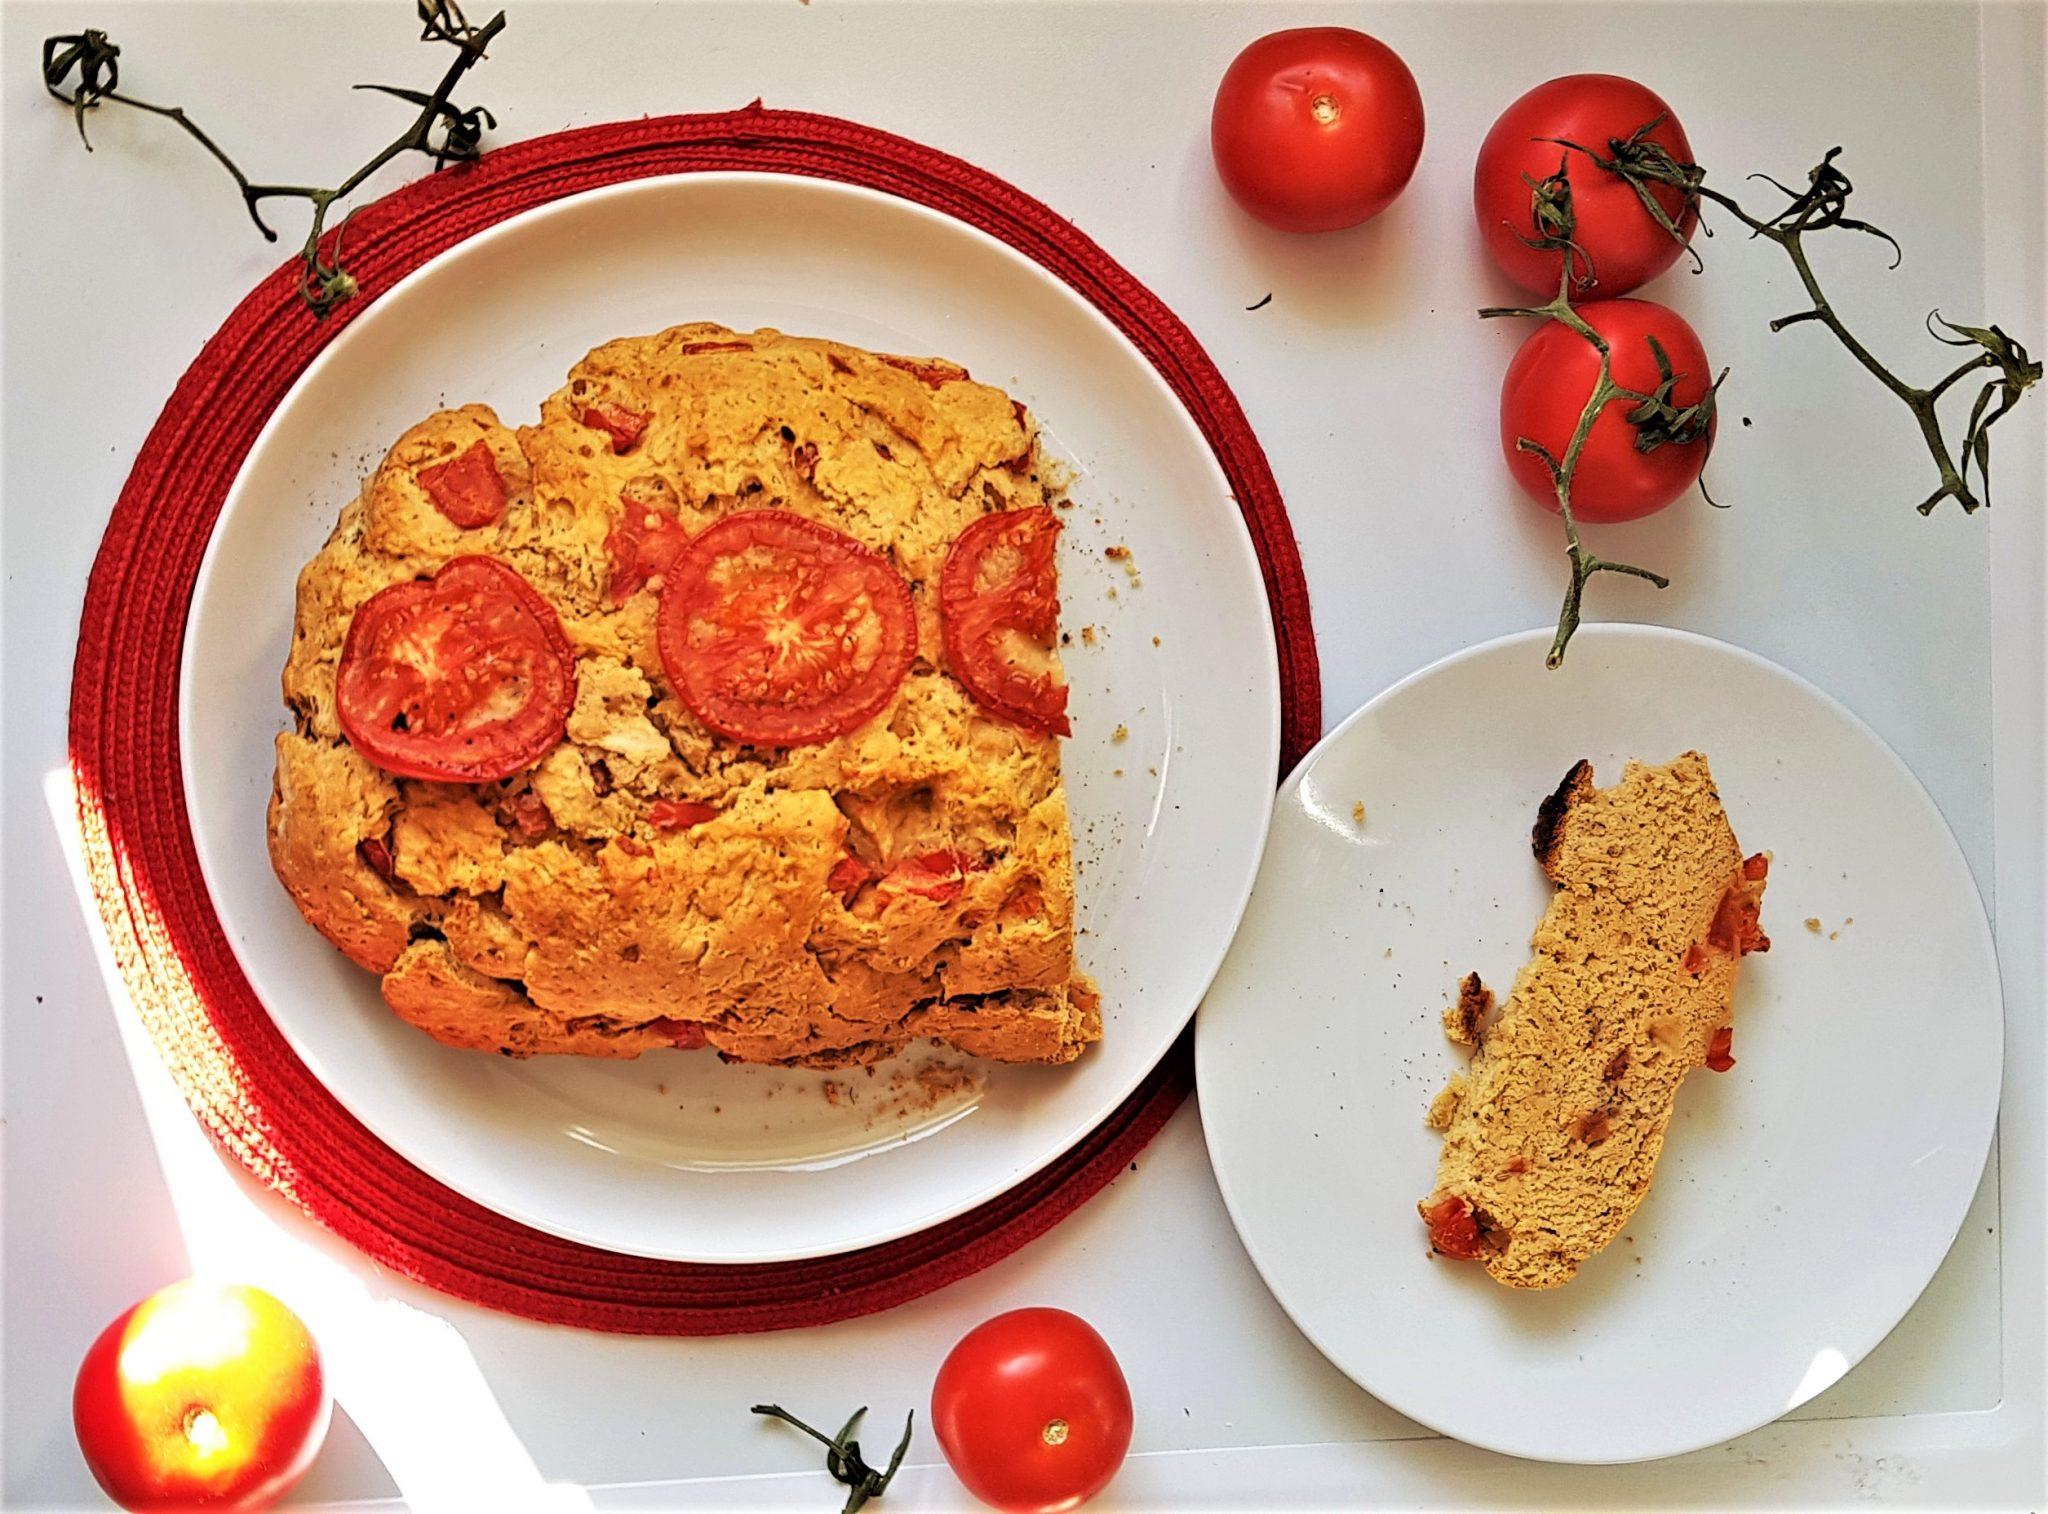 5-ingredient yeast free tomato bread - fiveforafiver